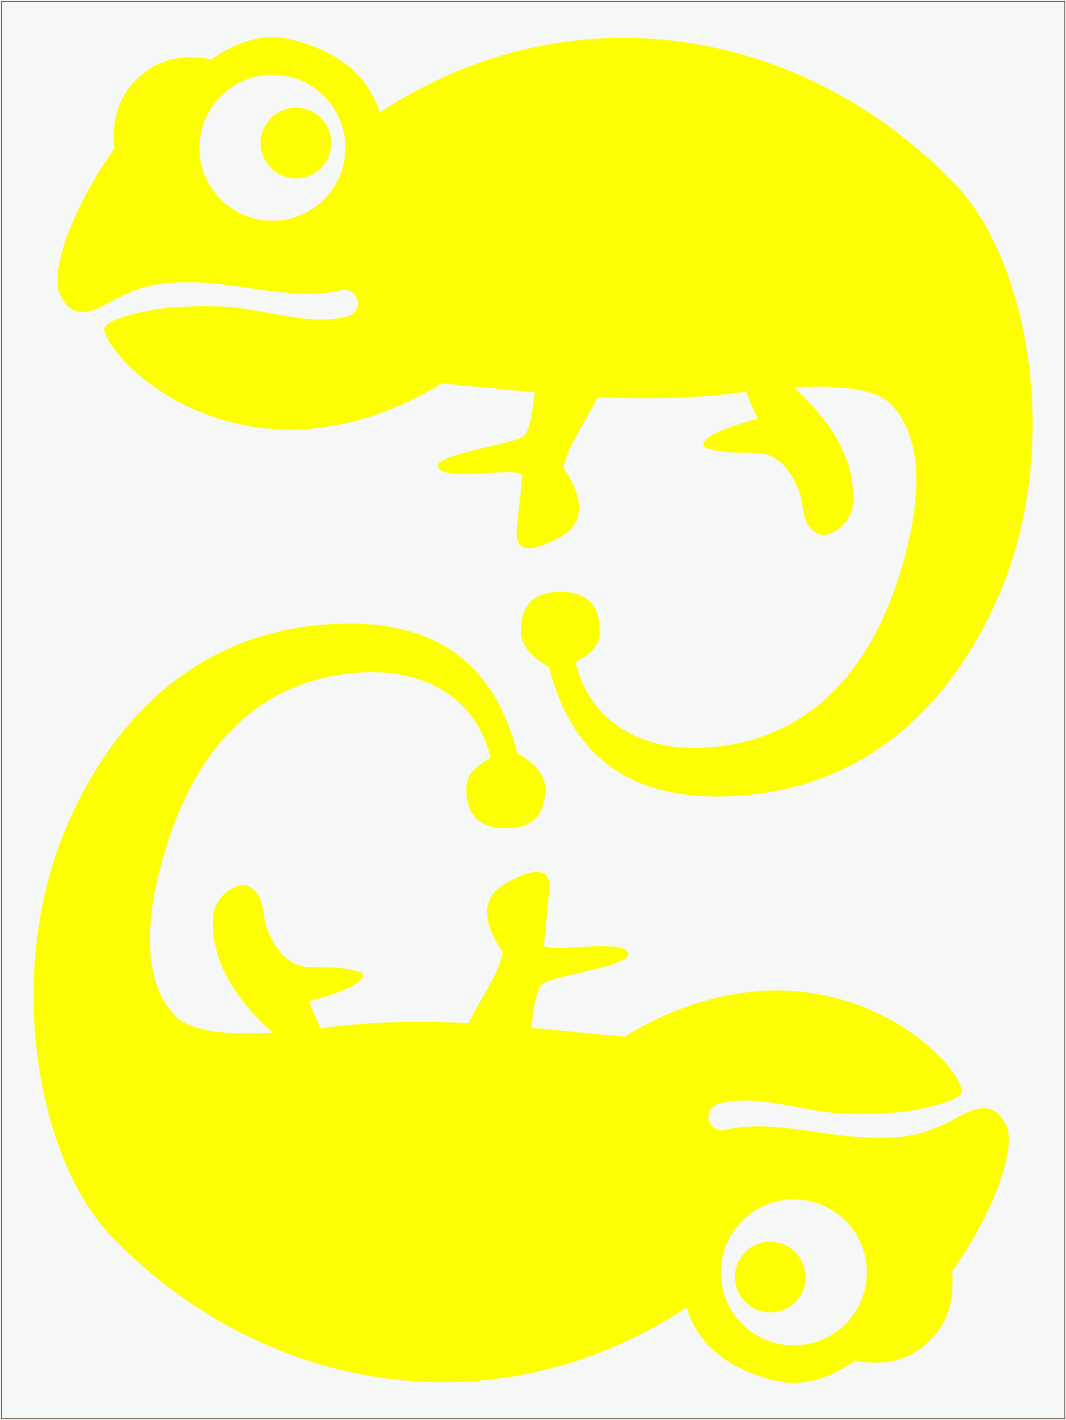 Chameleón neon